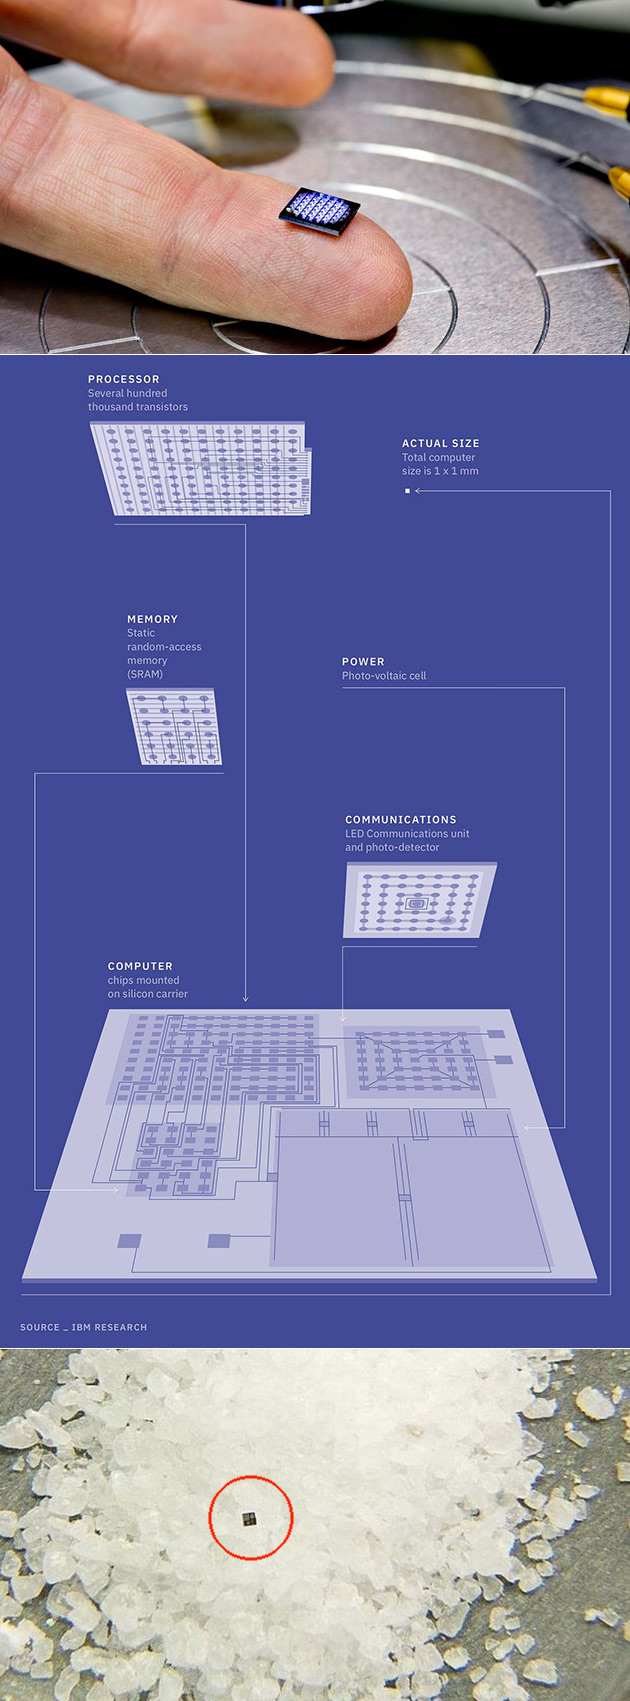 IBM World's Smallest Computer